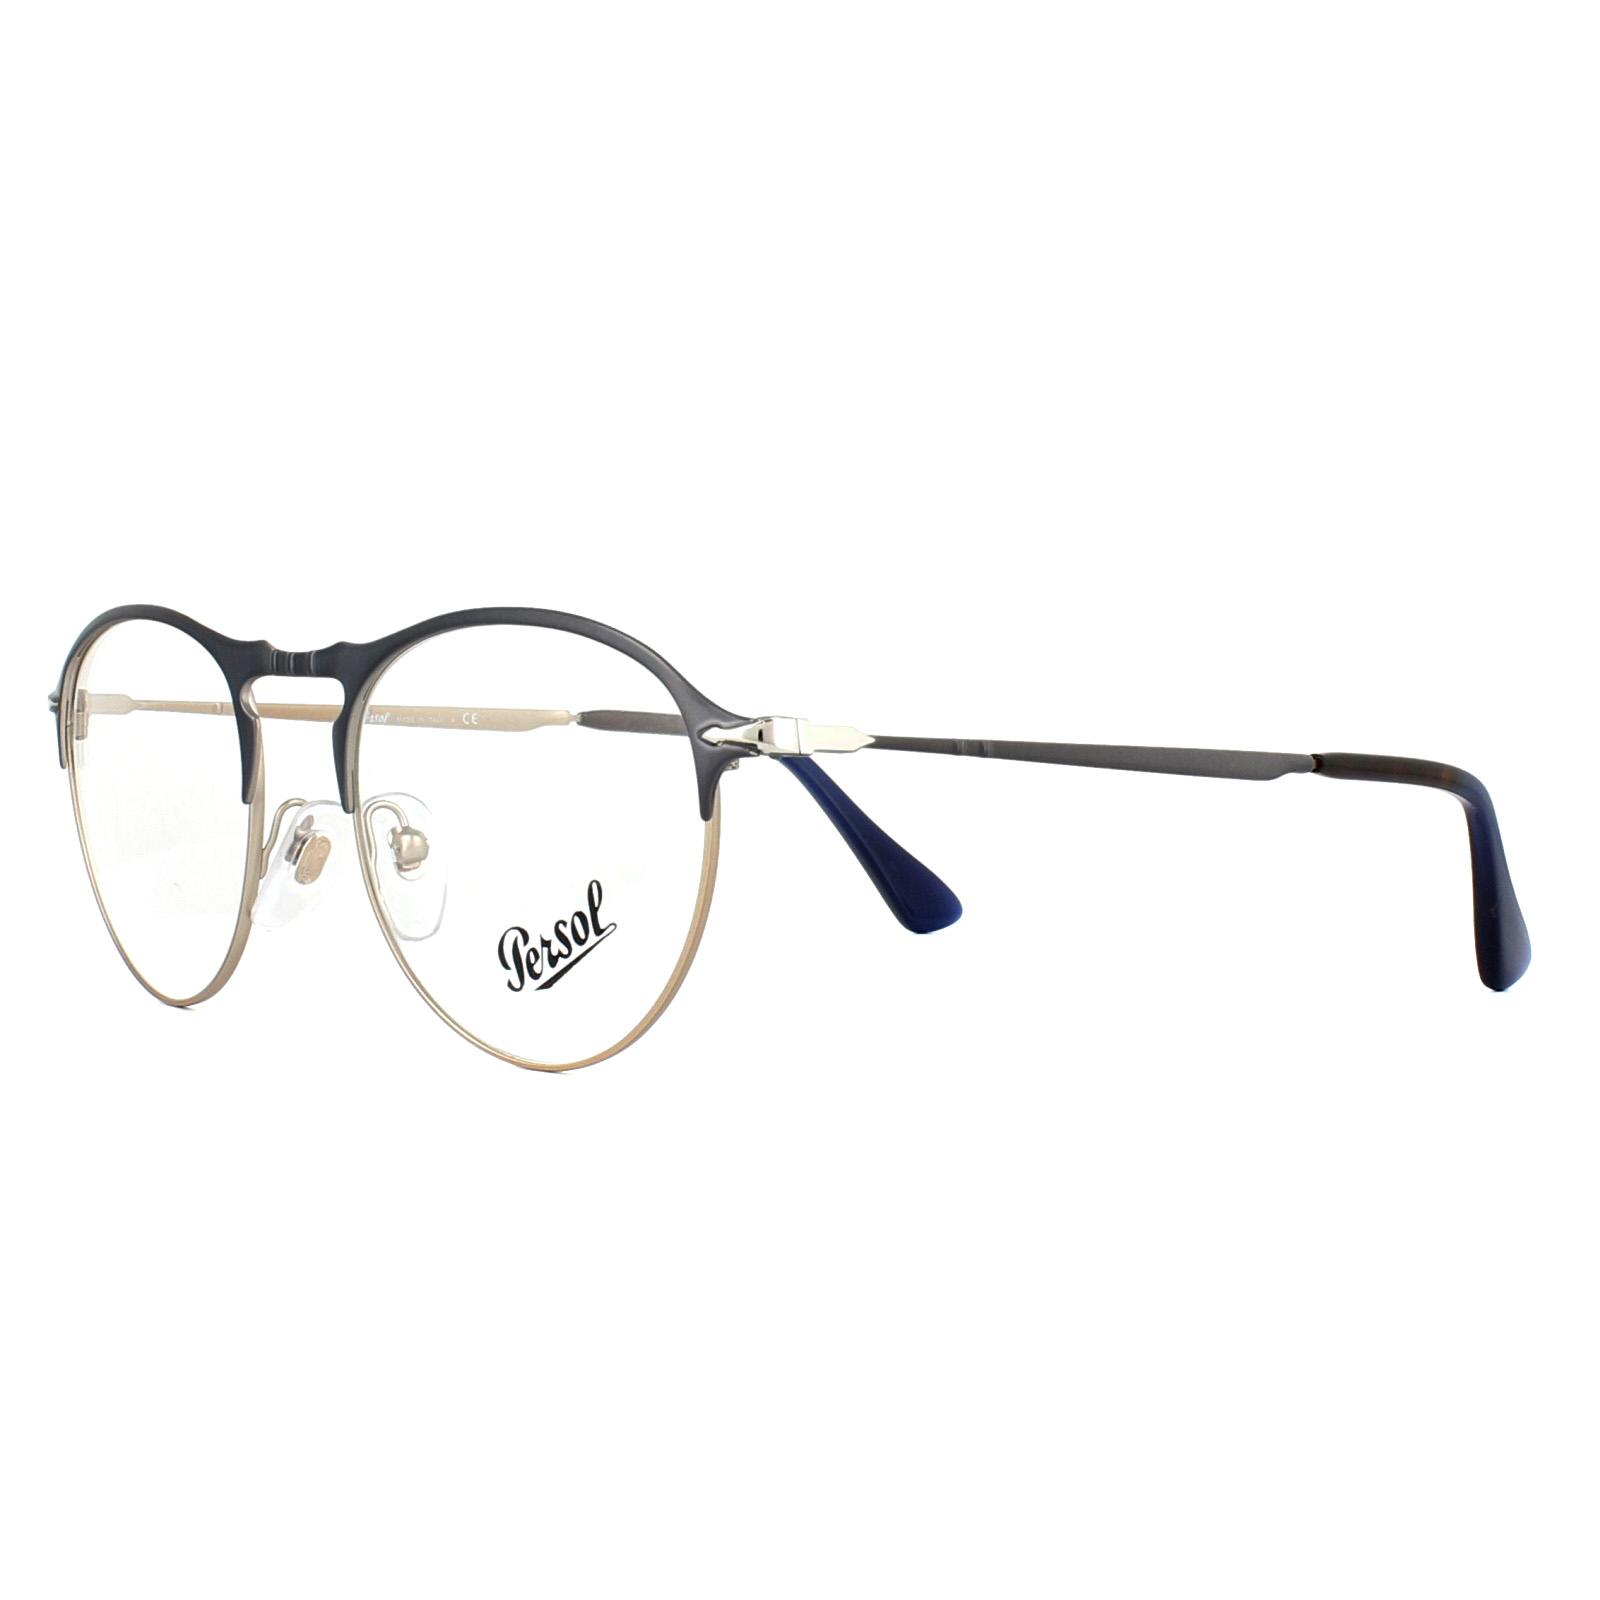 6379b33469 Sentinel Persol Glasses Frames PO7092V 1073 Blue Bronze 50mm Mens